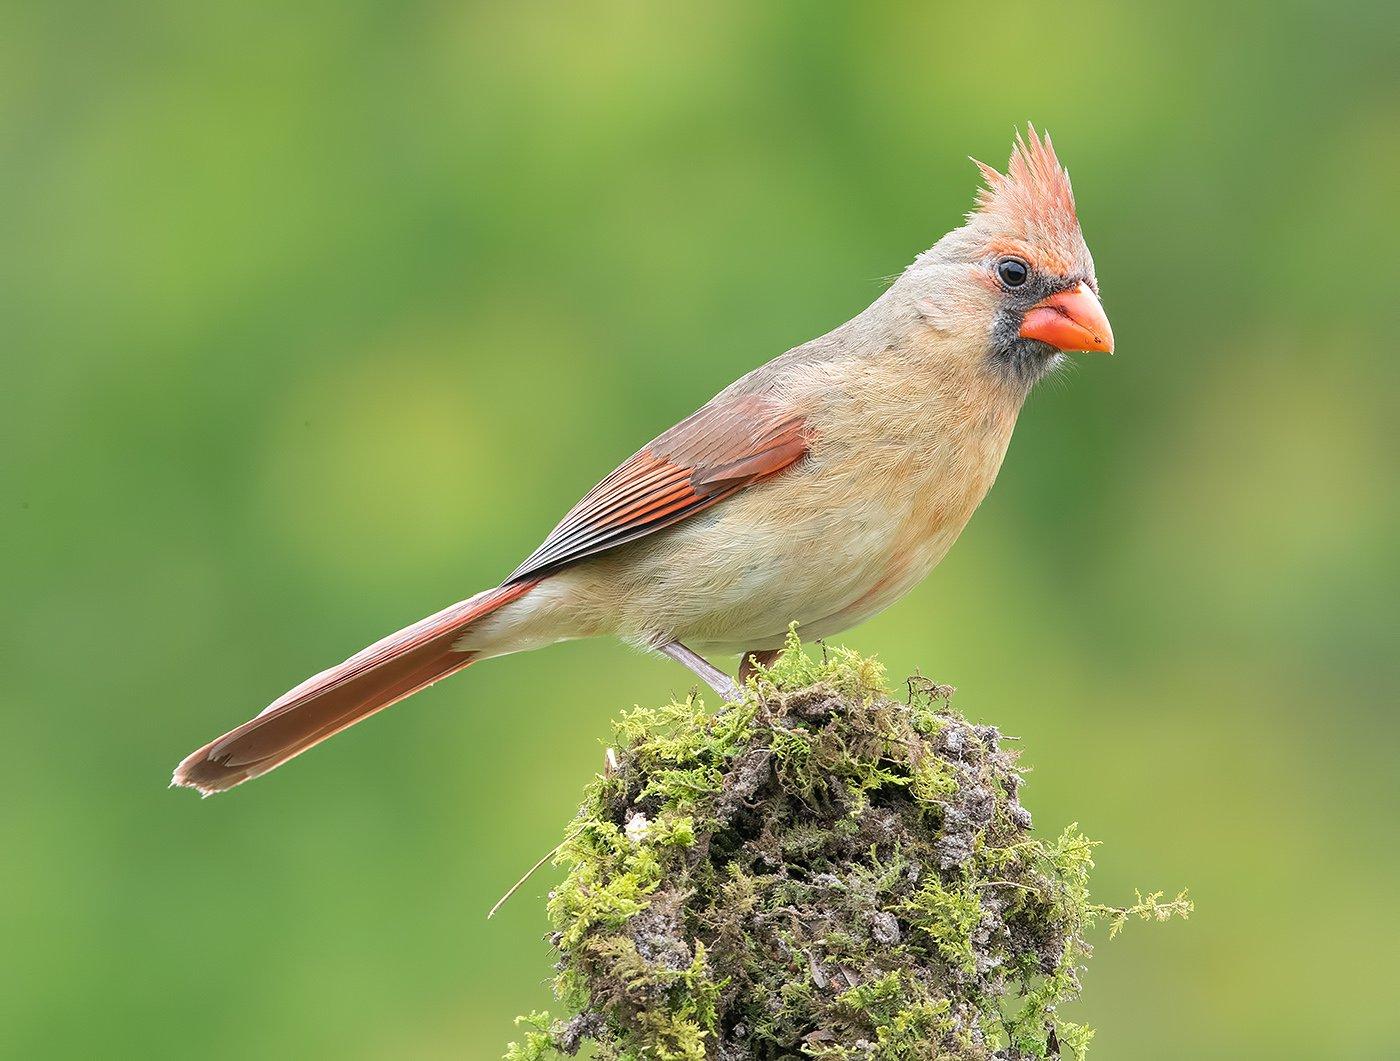 красный кардинал, northern cardinal,cardinal, кардинал, Elizabeth E